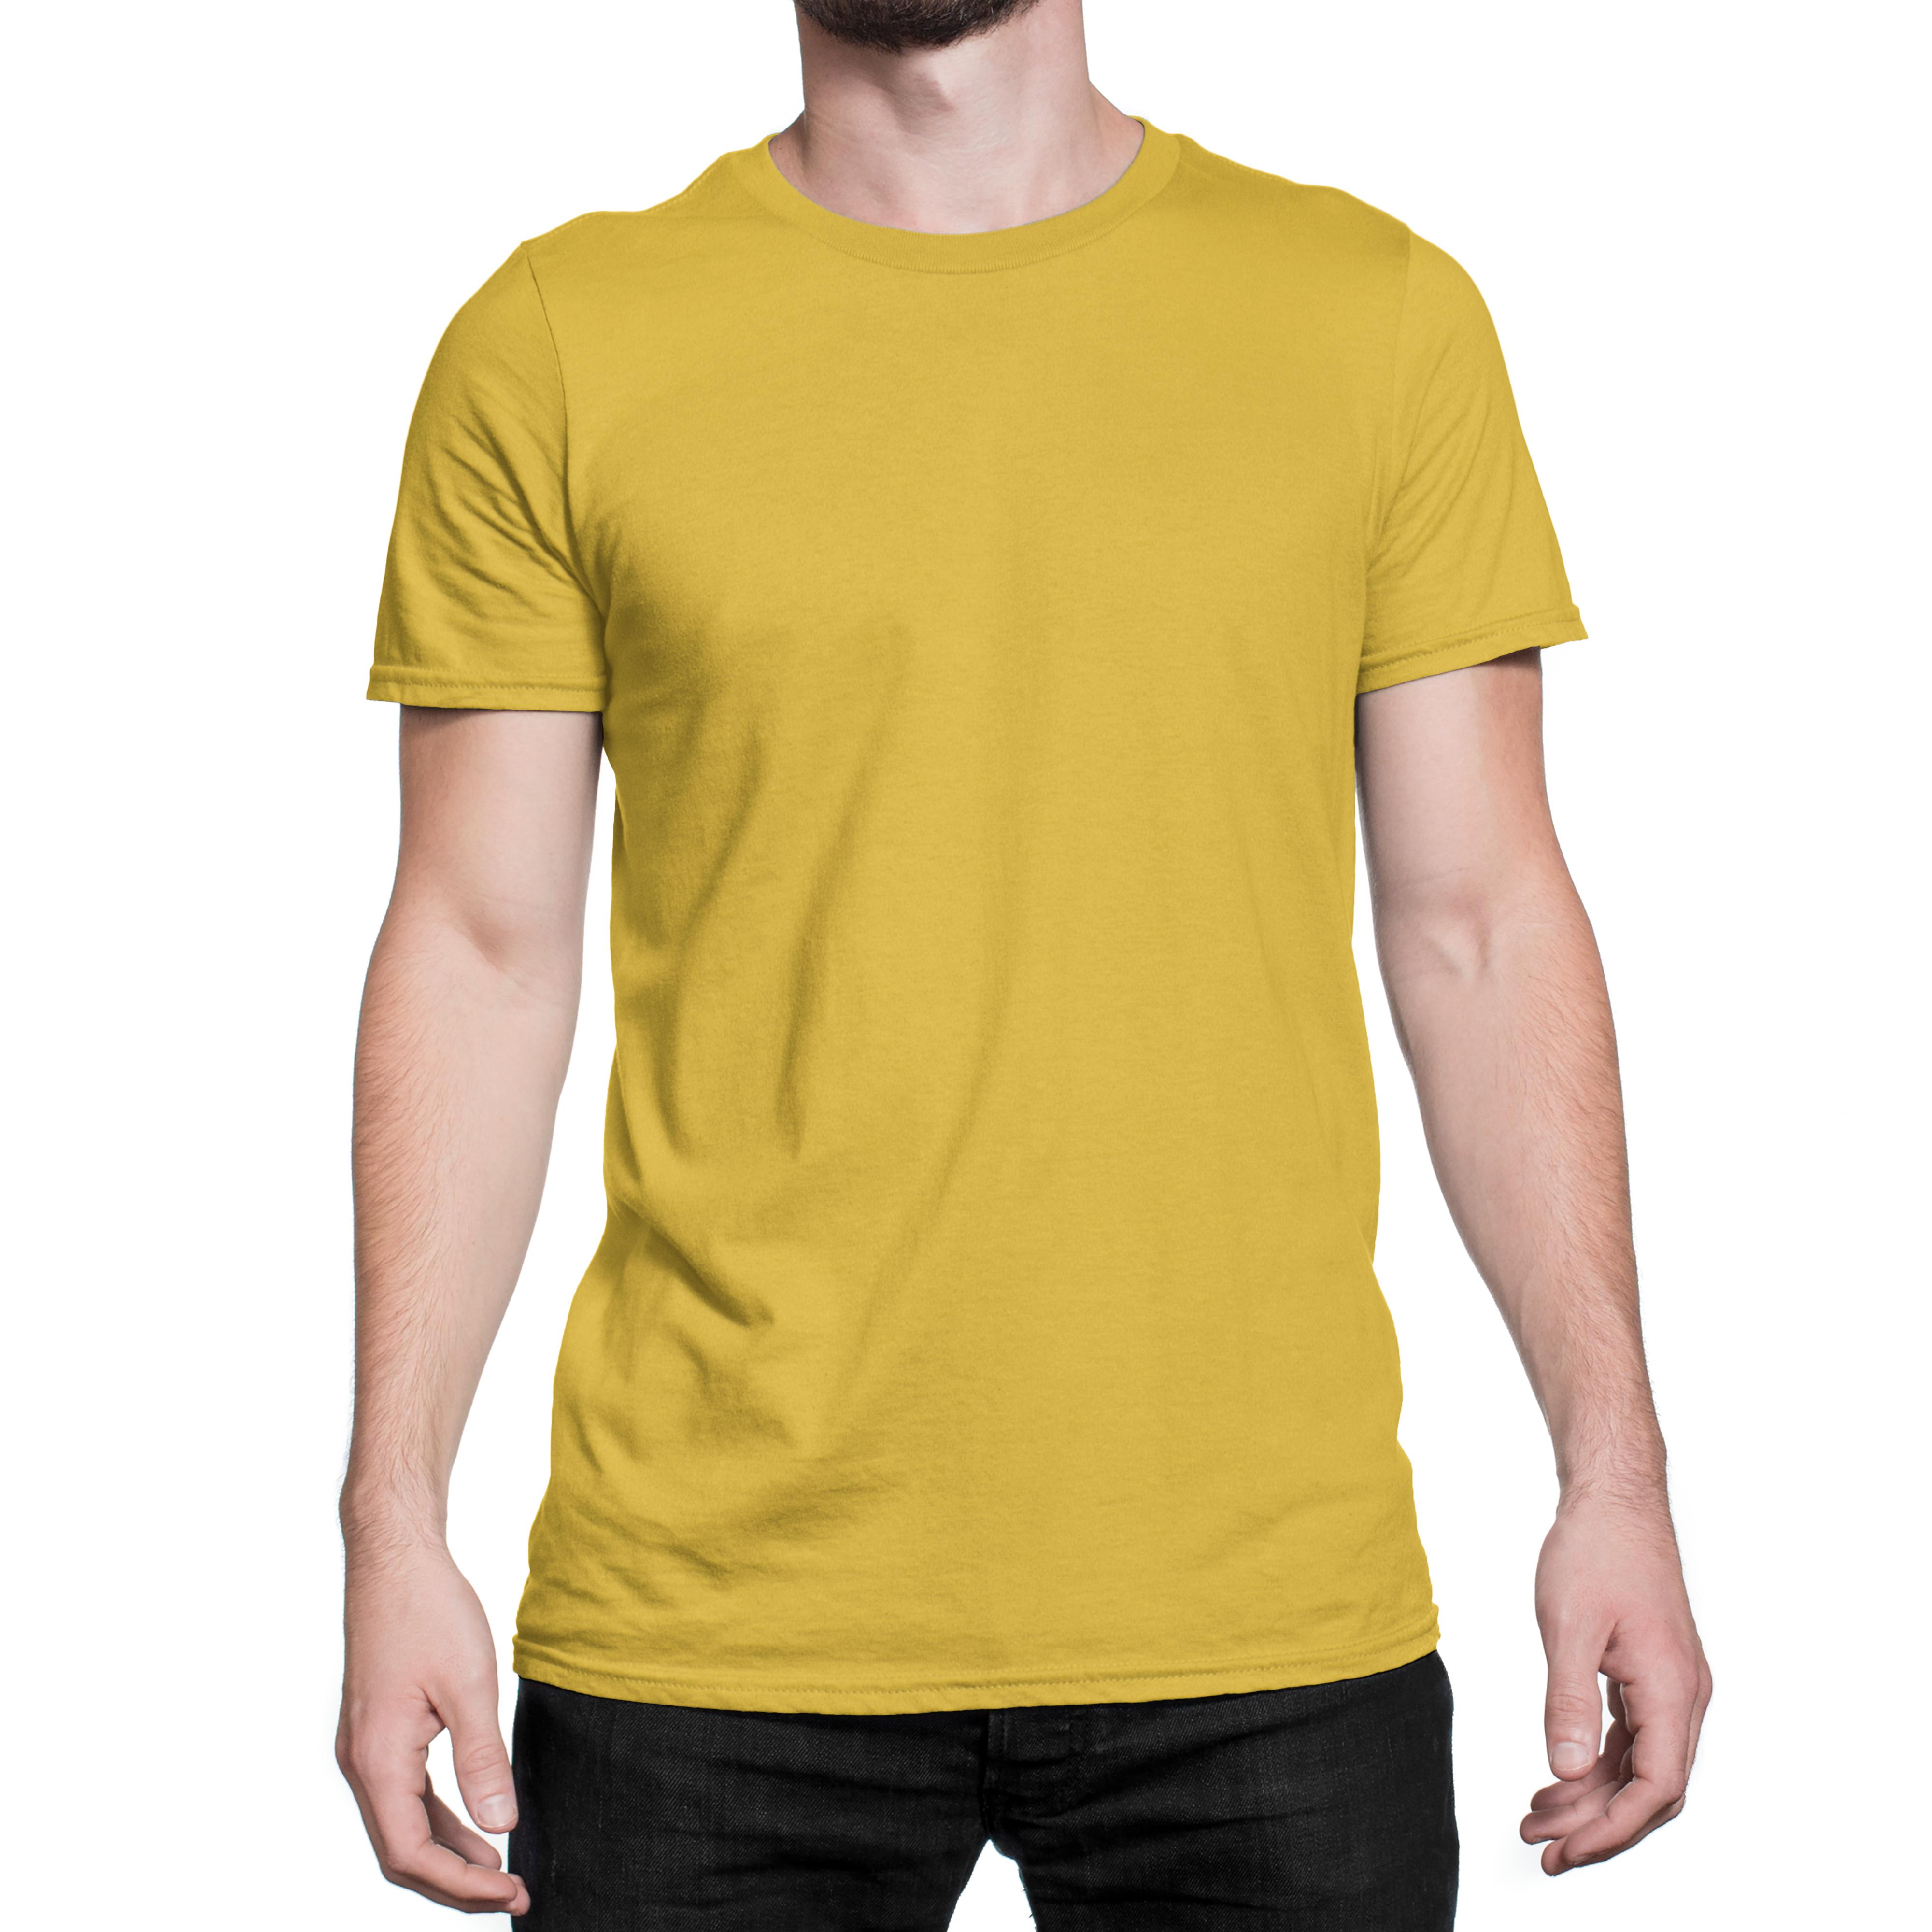 Plain Yellow T Shirt Unisex Front View Colorcapital Plain Yellow T Shirt Yellow T Shirt Mens Tops